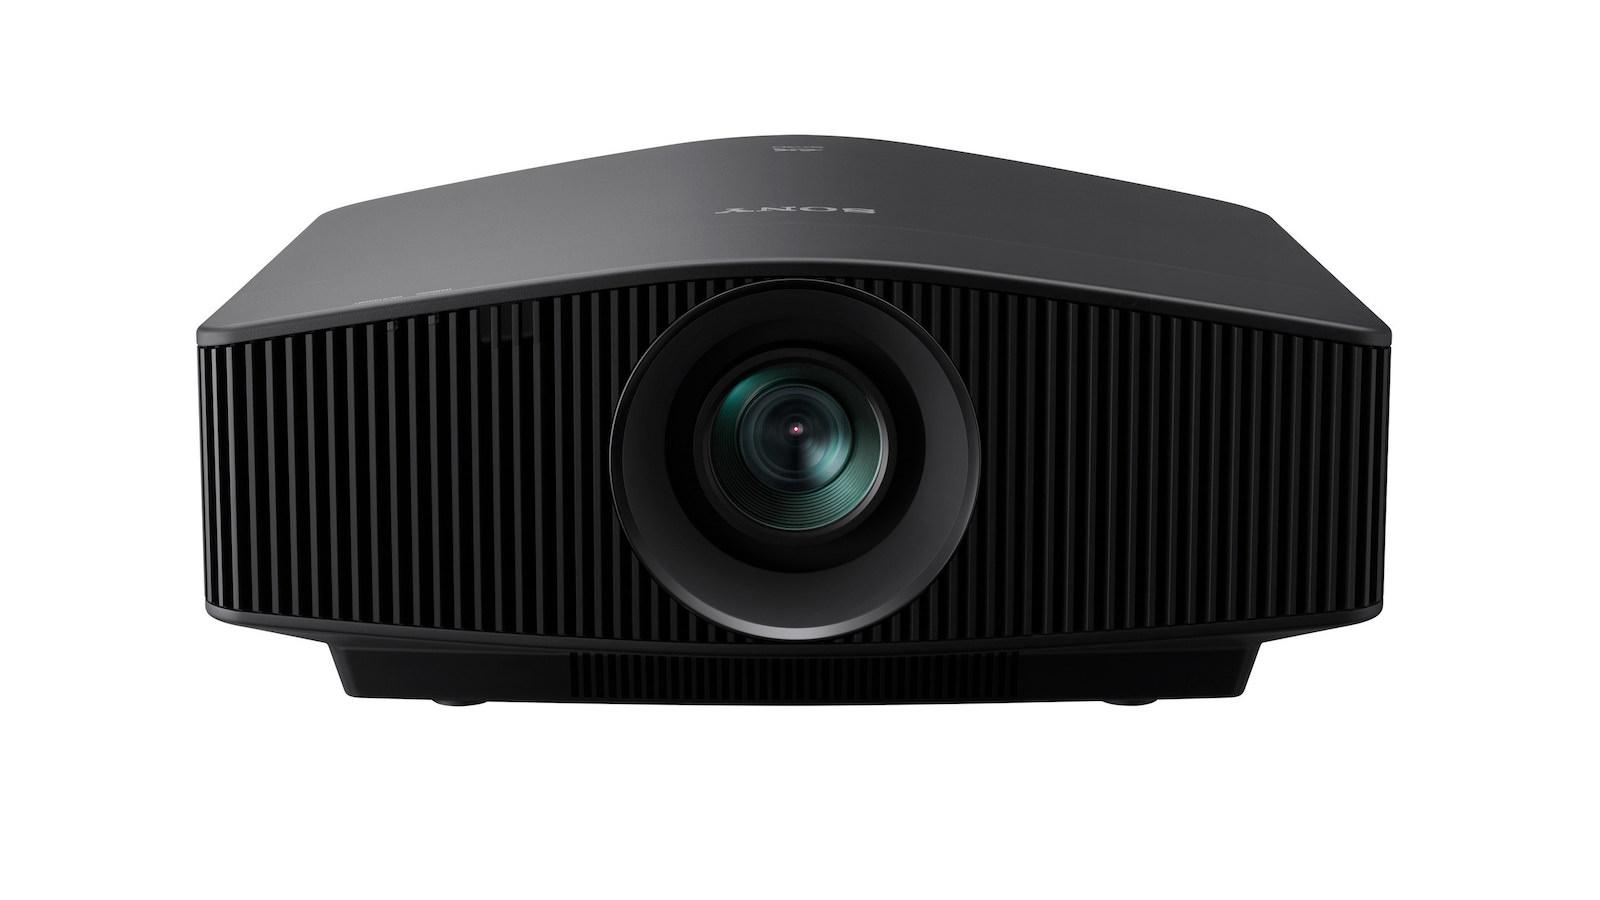 Sony VPL-VW915ES 4K laser projector